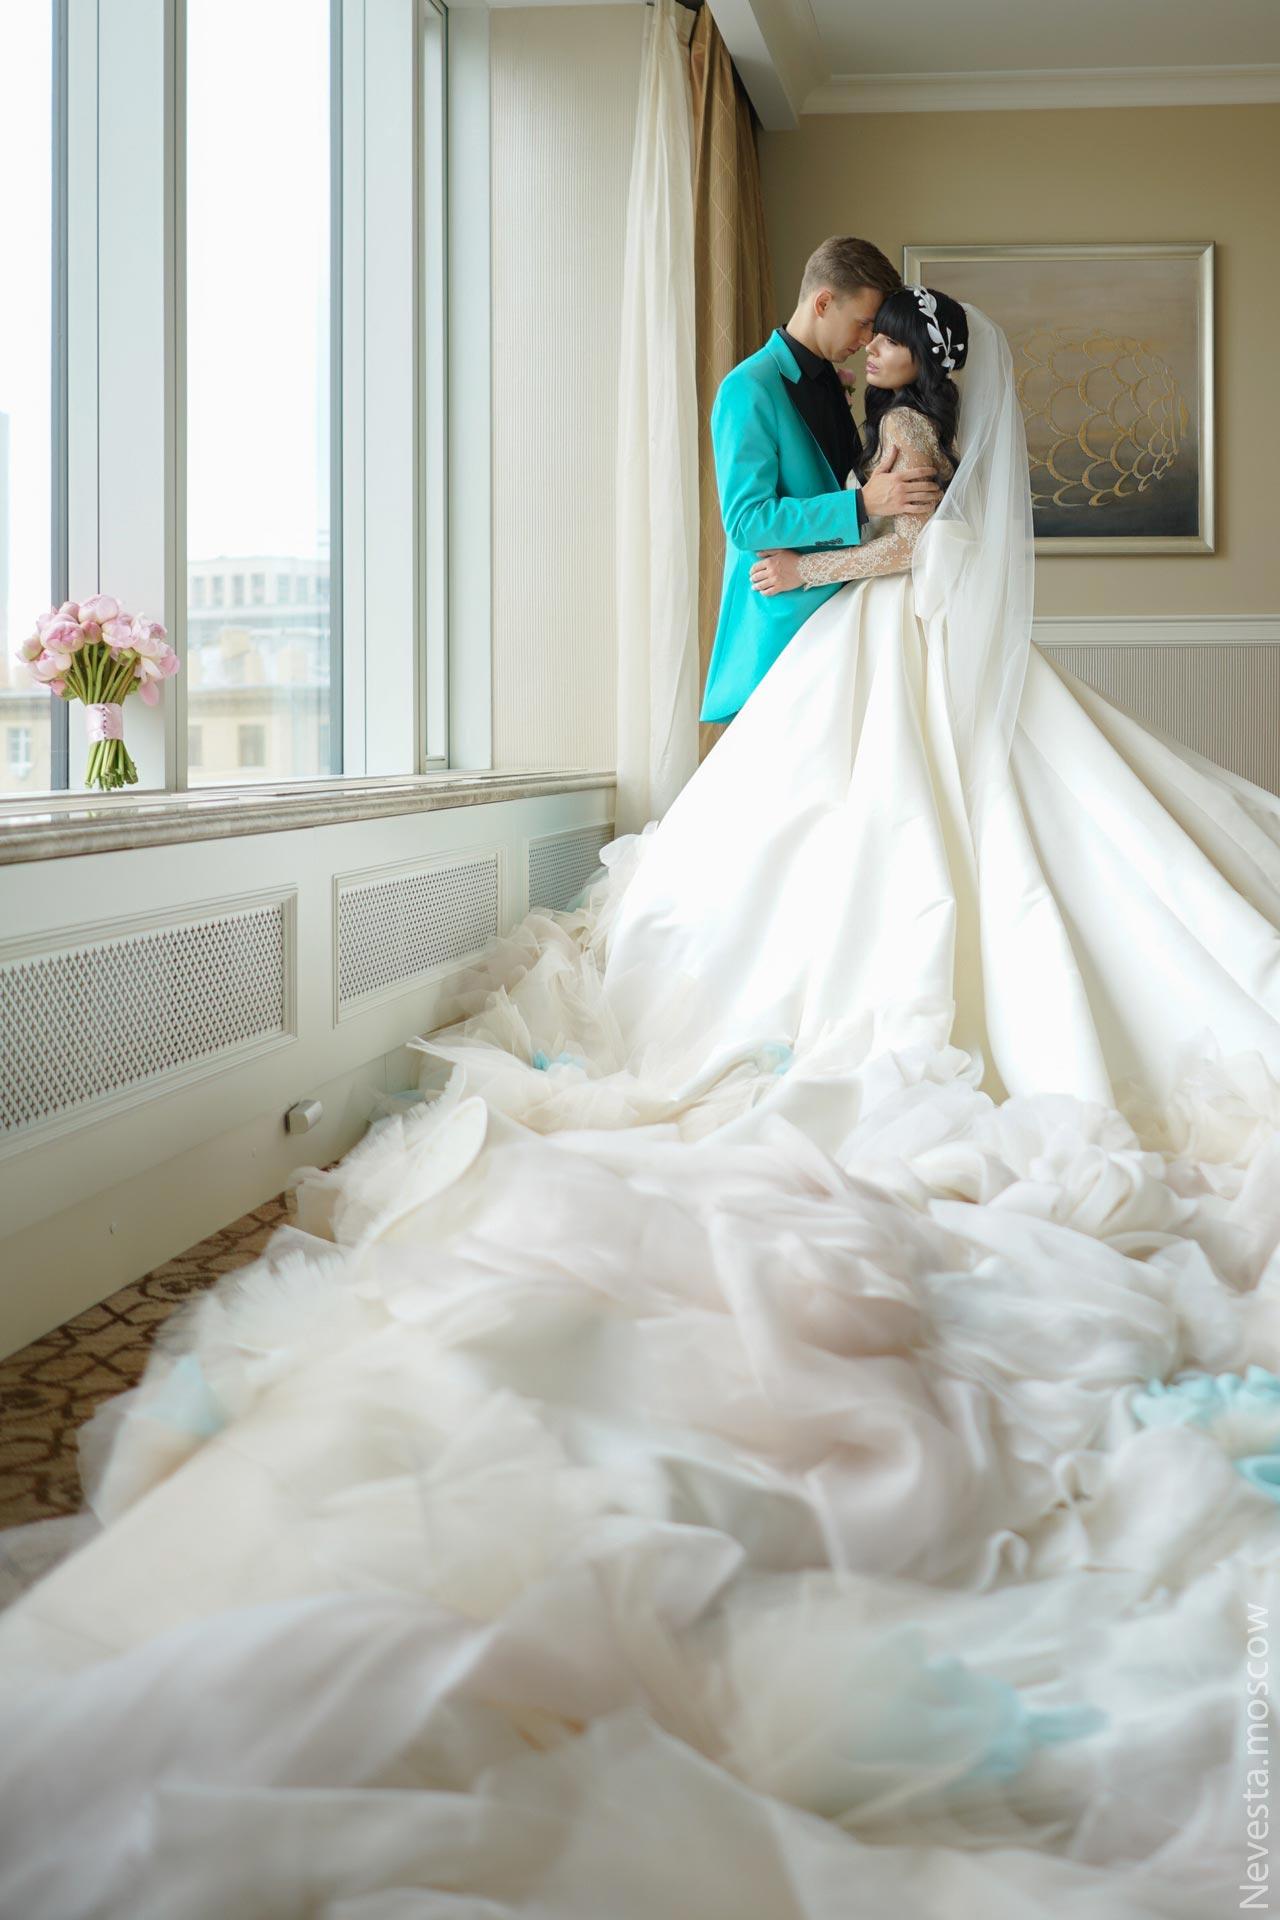 Свадьба Нелли Ермолаевой и Кирилла Андреева фото 14